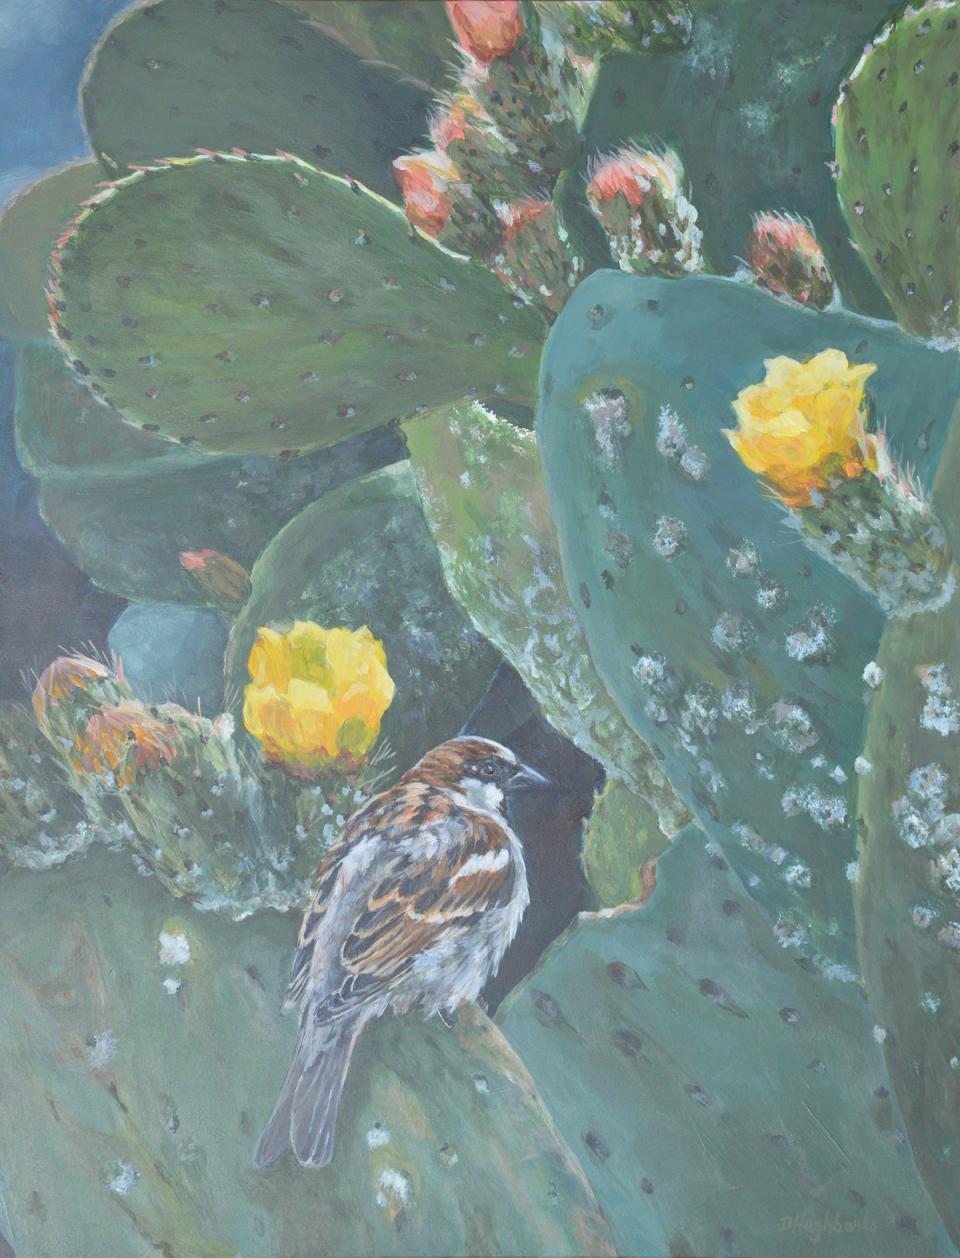 | Wallhanging by Debbie Hughbanks | Artists for Conservation